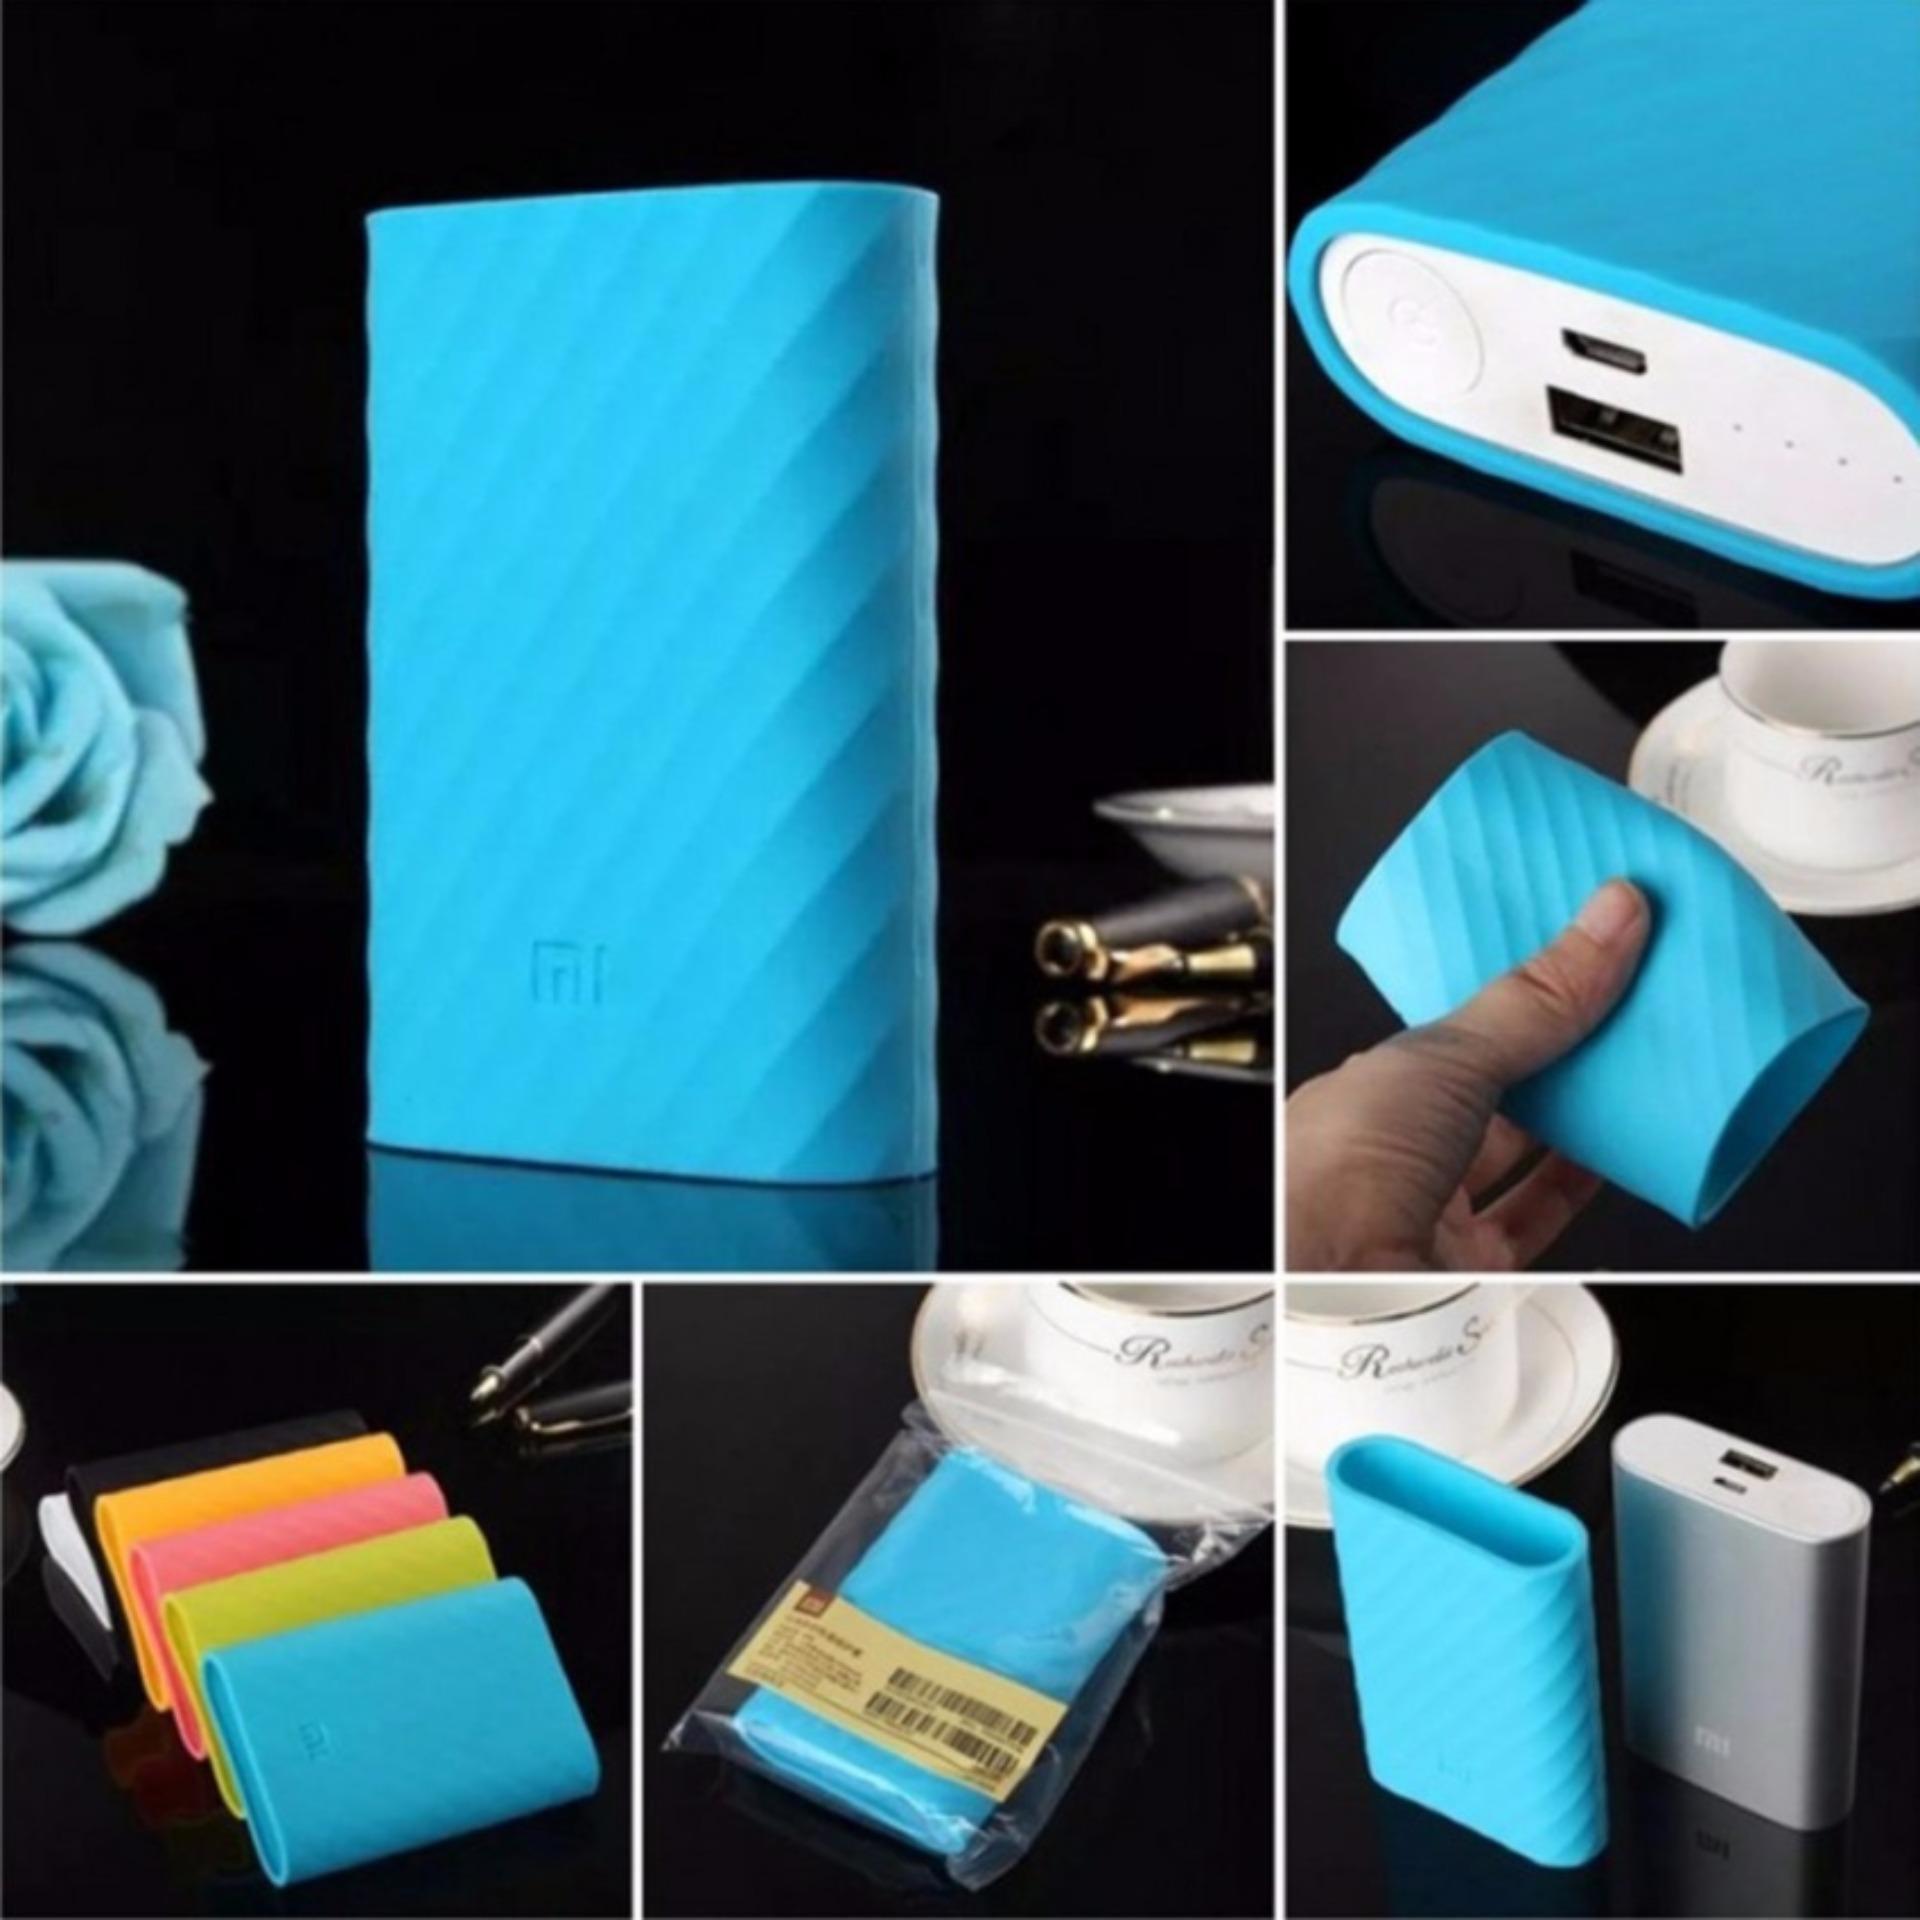 Xiaomi Silicon Case For Mi Power Bank 10000 Mah Biru Daftar Harga Silicone Powerbank Free Teiton Cover Sarung Pelindung 10000mah Oem Black